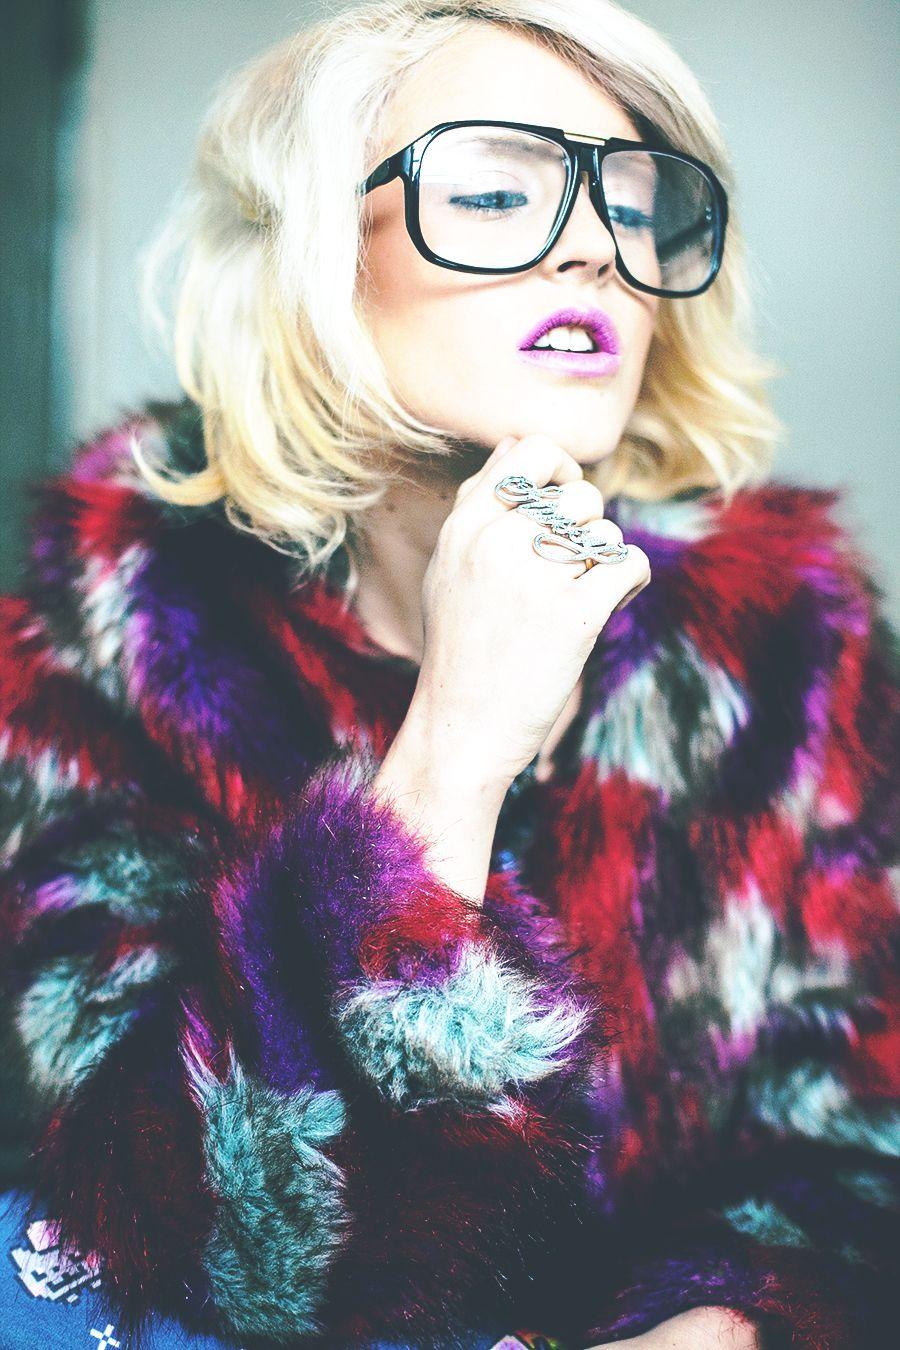 I hate blonde oversize nerd retro square clear lens glasses